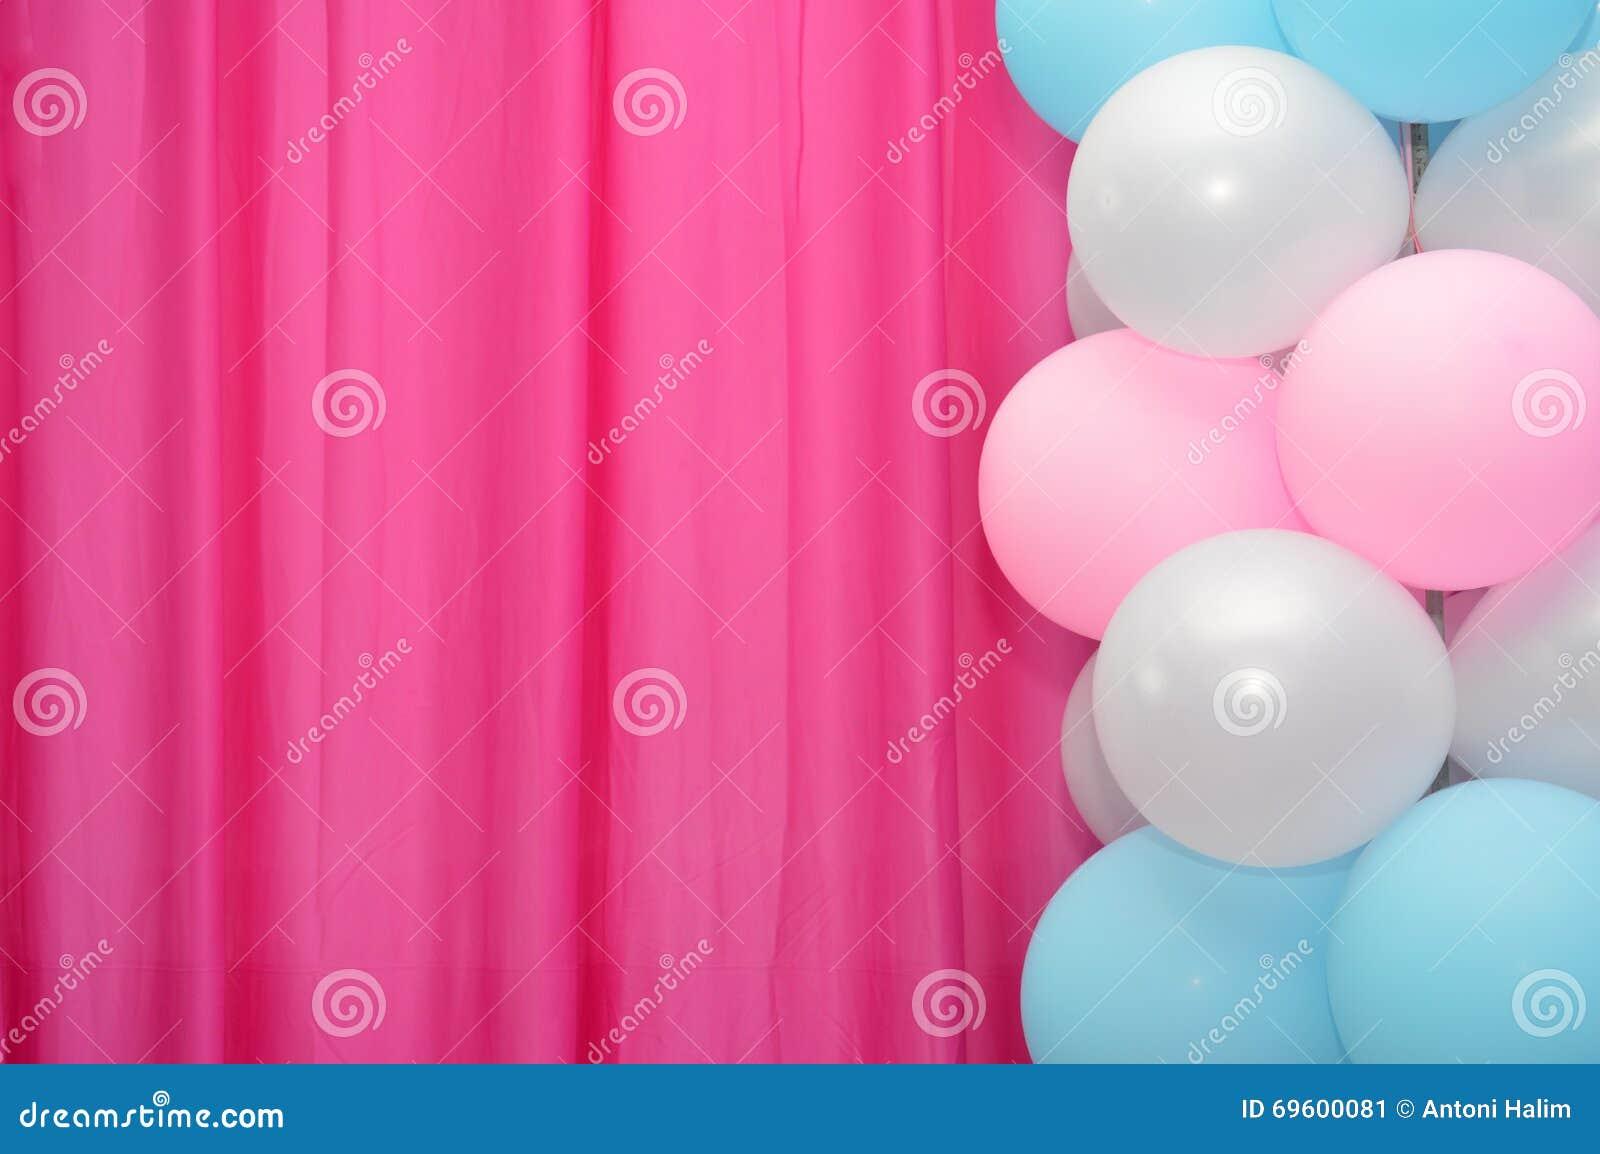 Ballon-Rahmen stockbild. Bild von gefüllt, geschenk, feier - 69600081